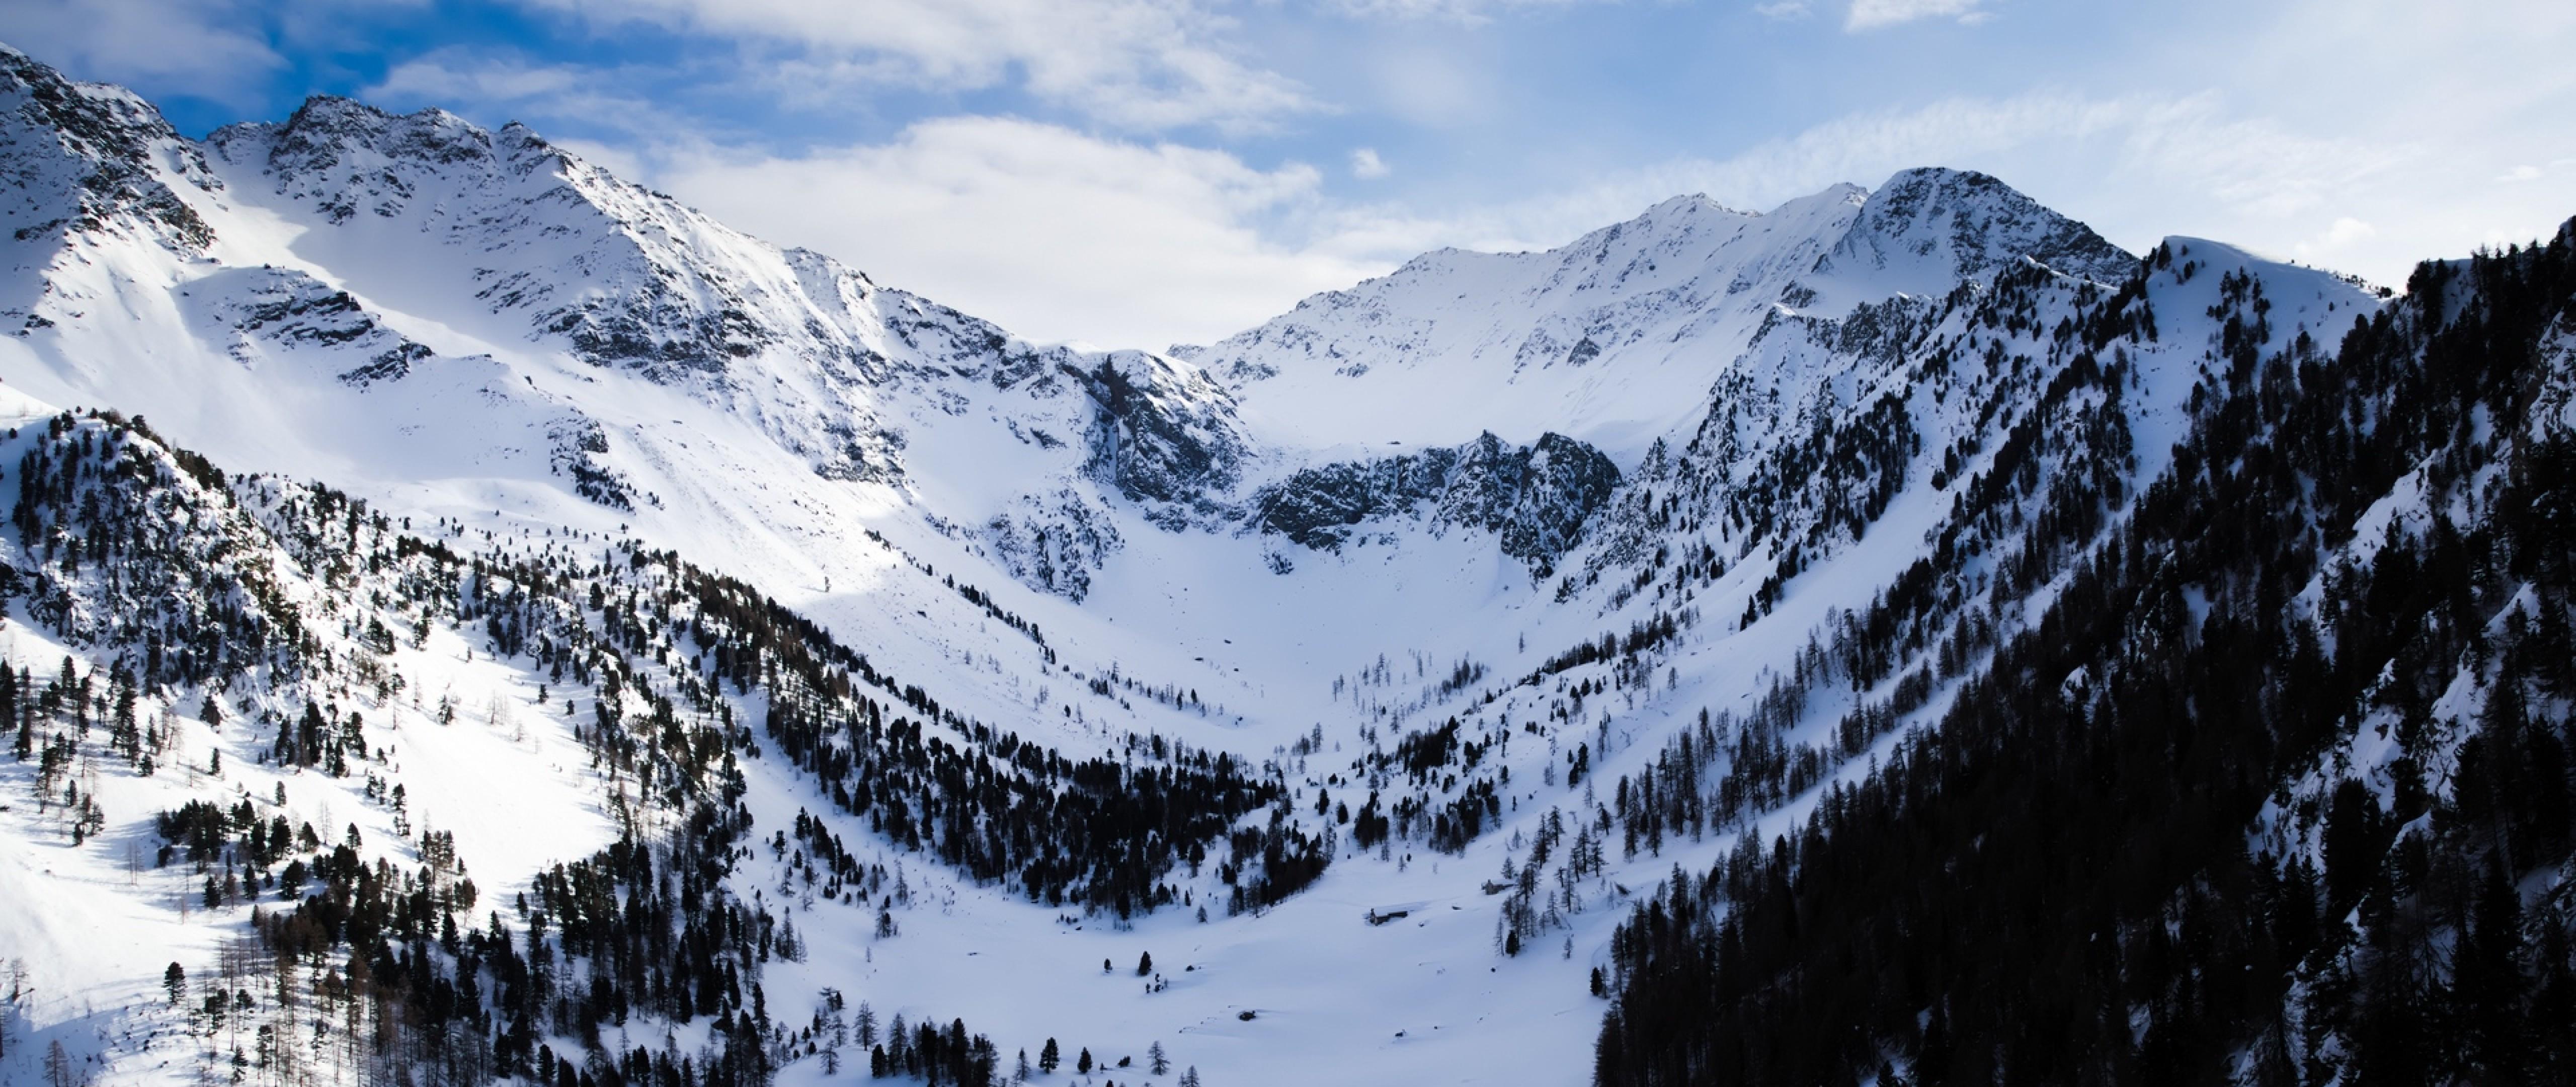 Alps Covered In Snow Hd Wallpaper 4k Ultra Hd Wide Tv Hd Wallpaper Wallpapers Net